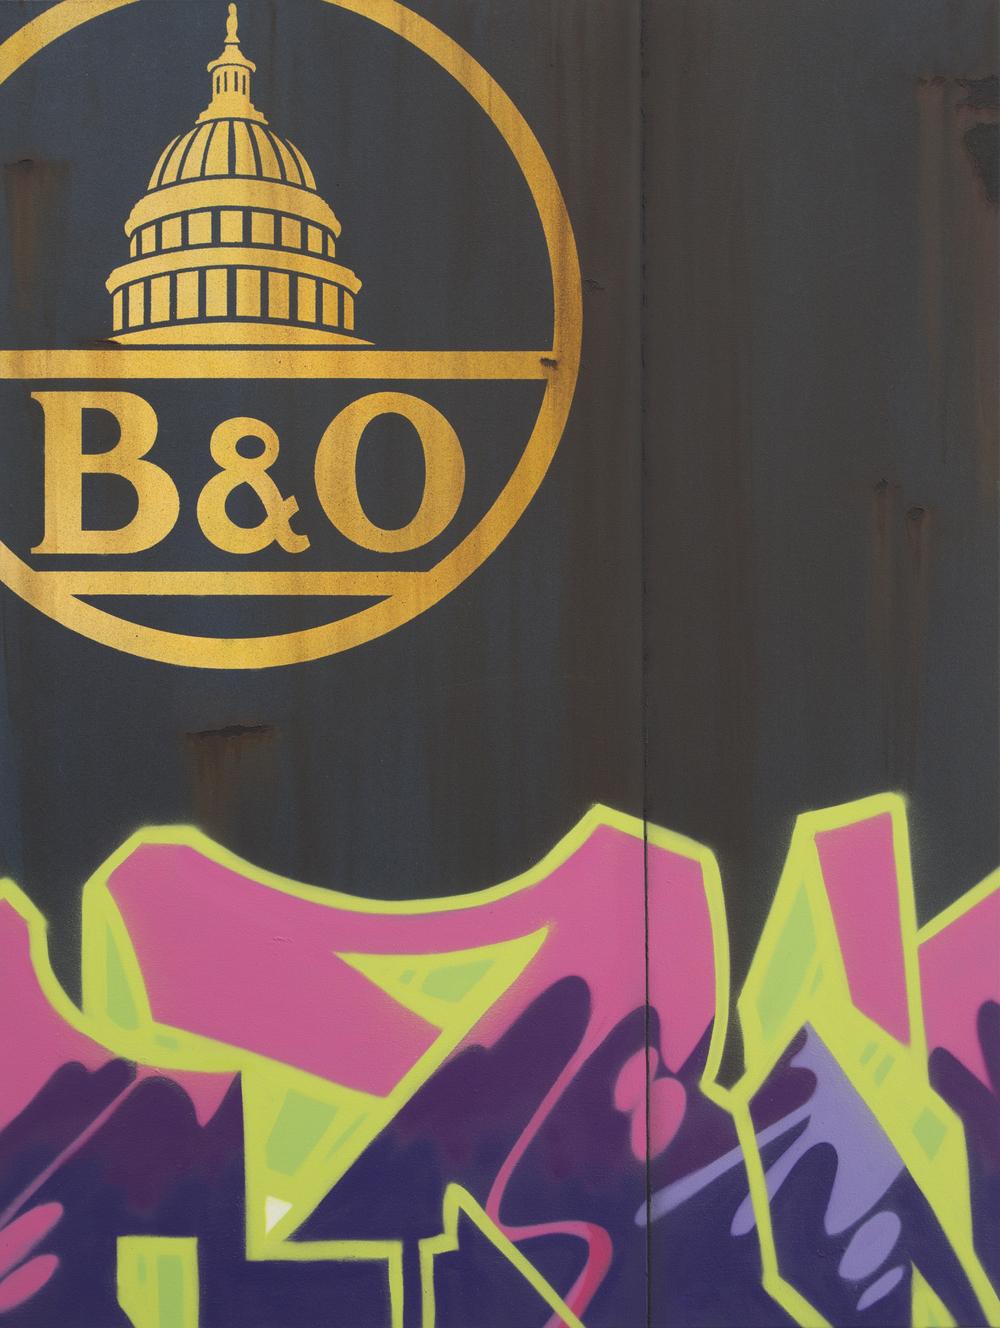 Blank Canvas #27 – B&O, Freight Train Painting, Boxcar Painting, Railroad Art, Tim Conlon Art